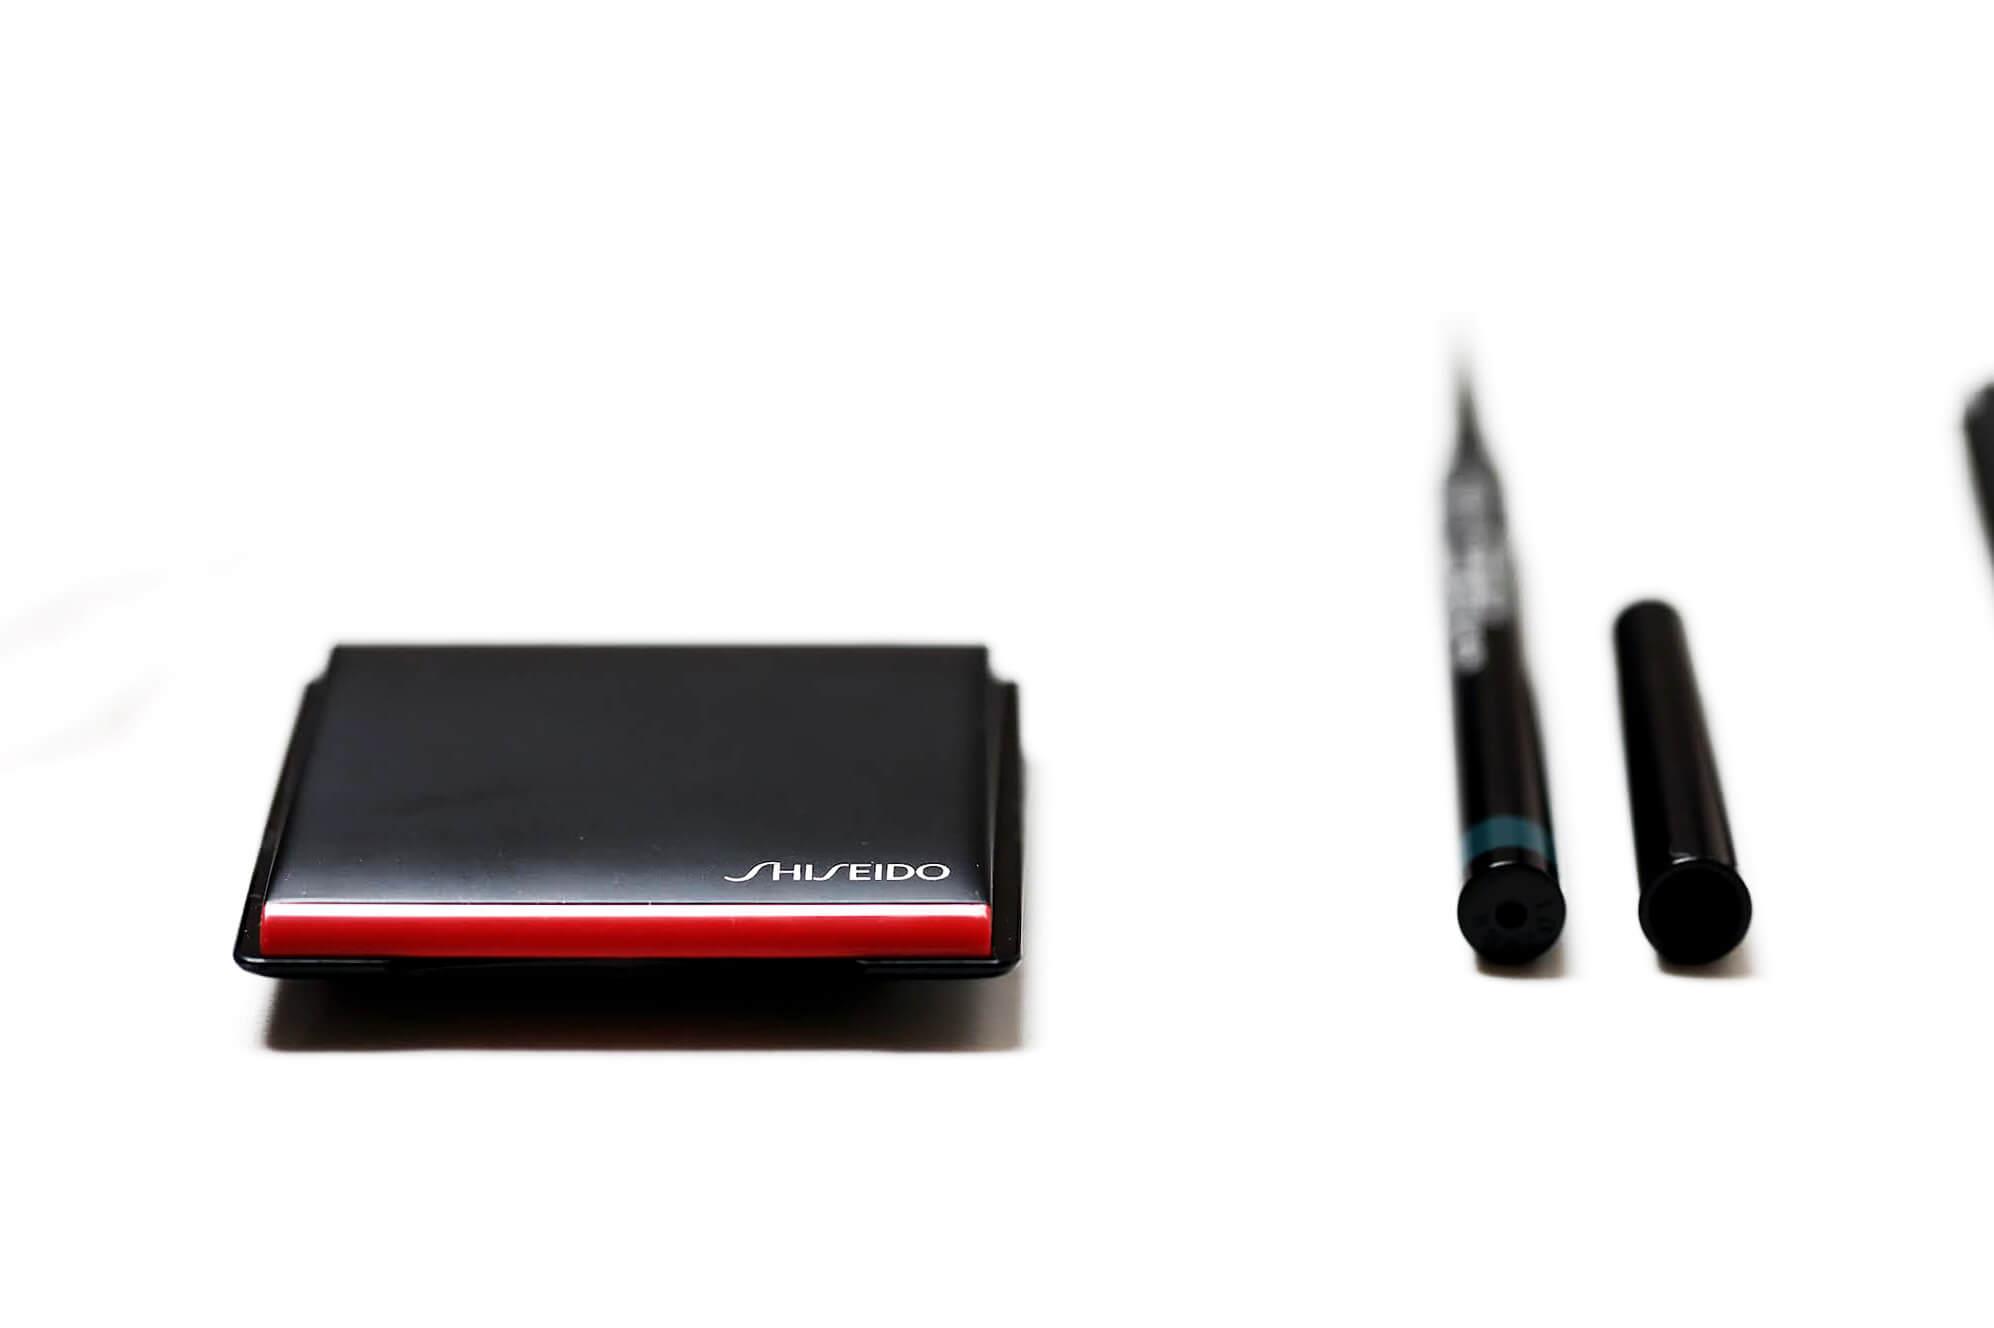 Shiseido Pop Powdergel fard à paupières avis